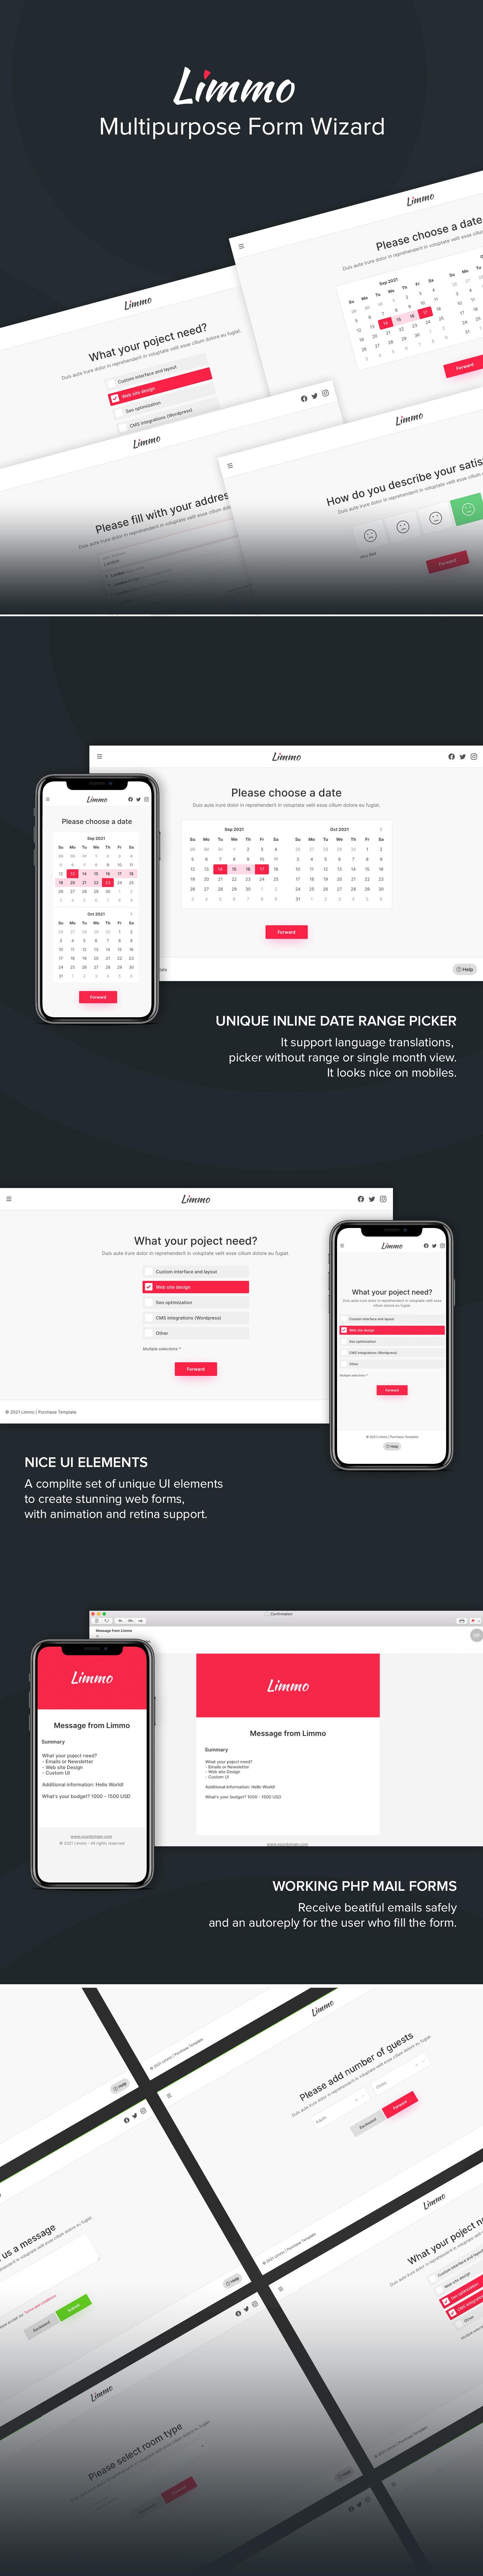 form mail UI/UX user interface Web Design  Website form wizard quotation registration reservation review